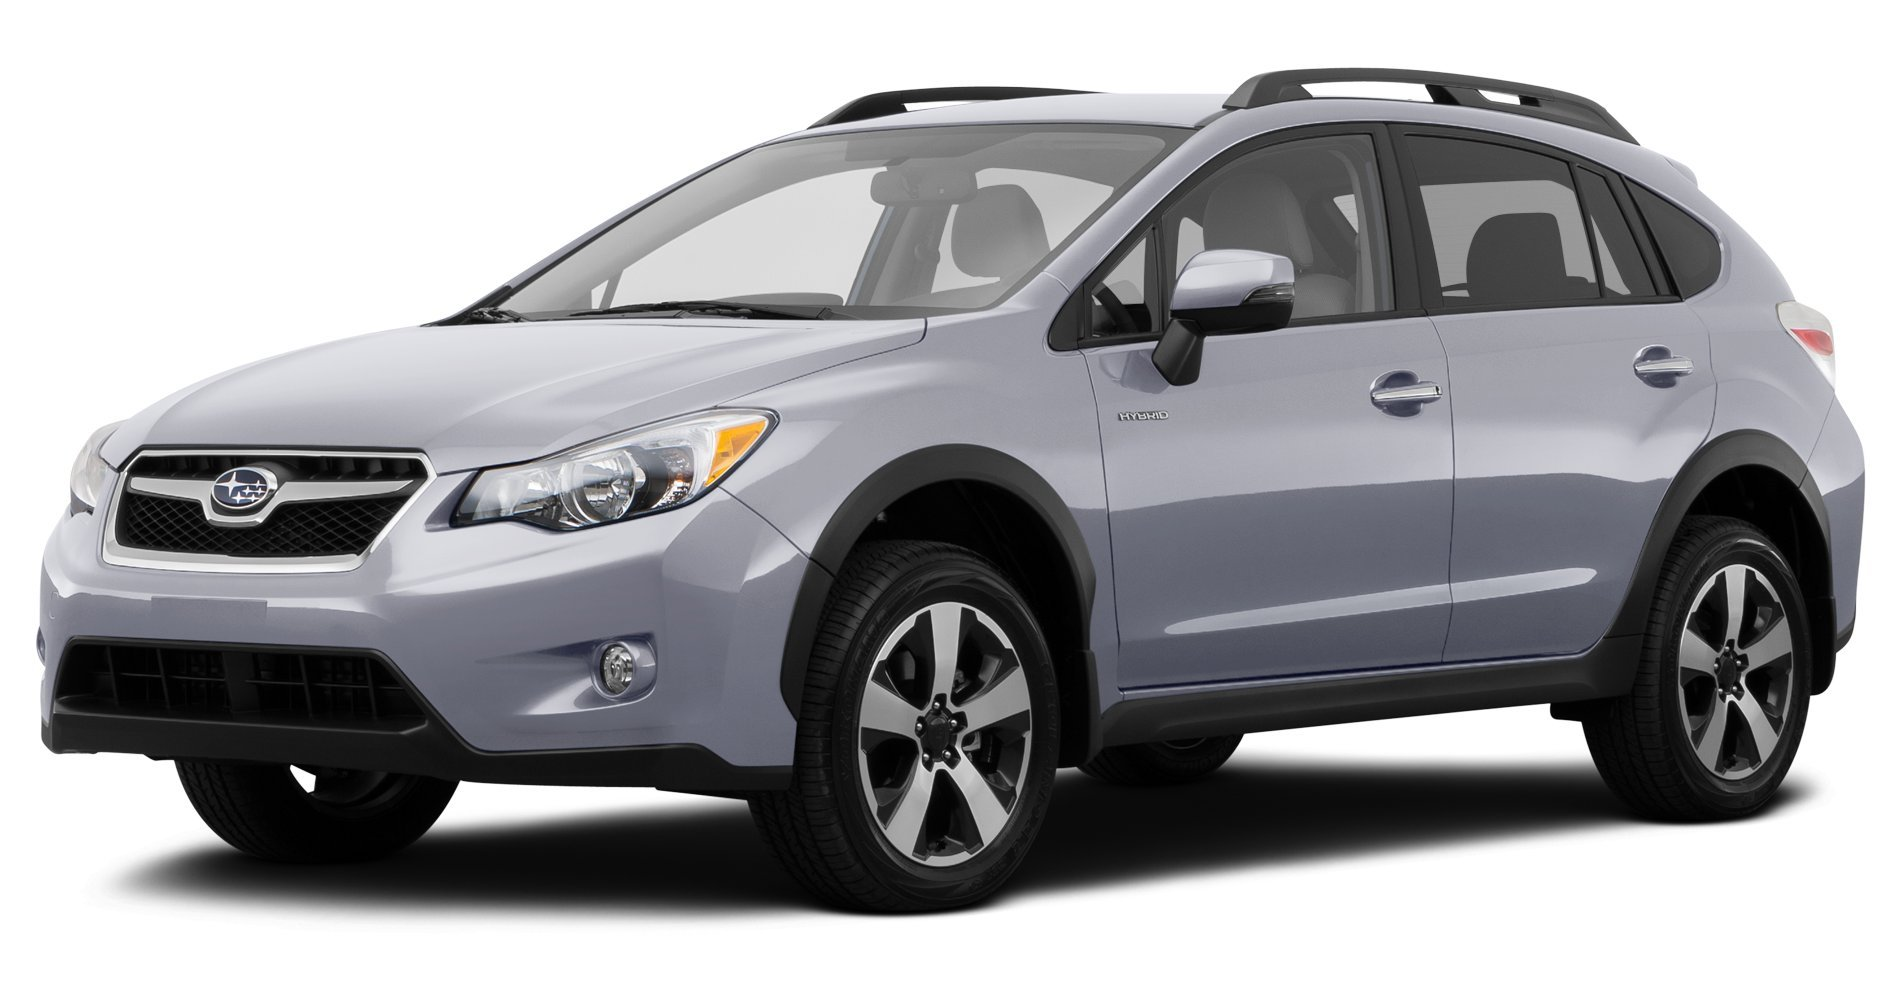 2014 Subaru XV Crosstrek Reviews, Images, Specs